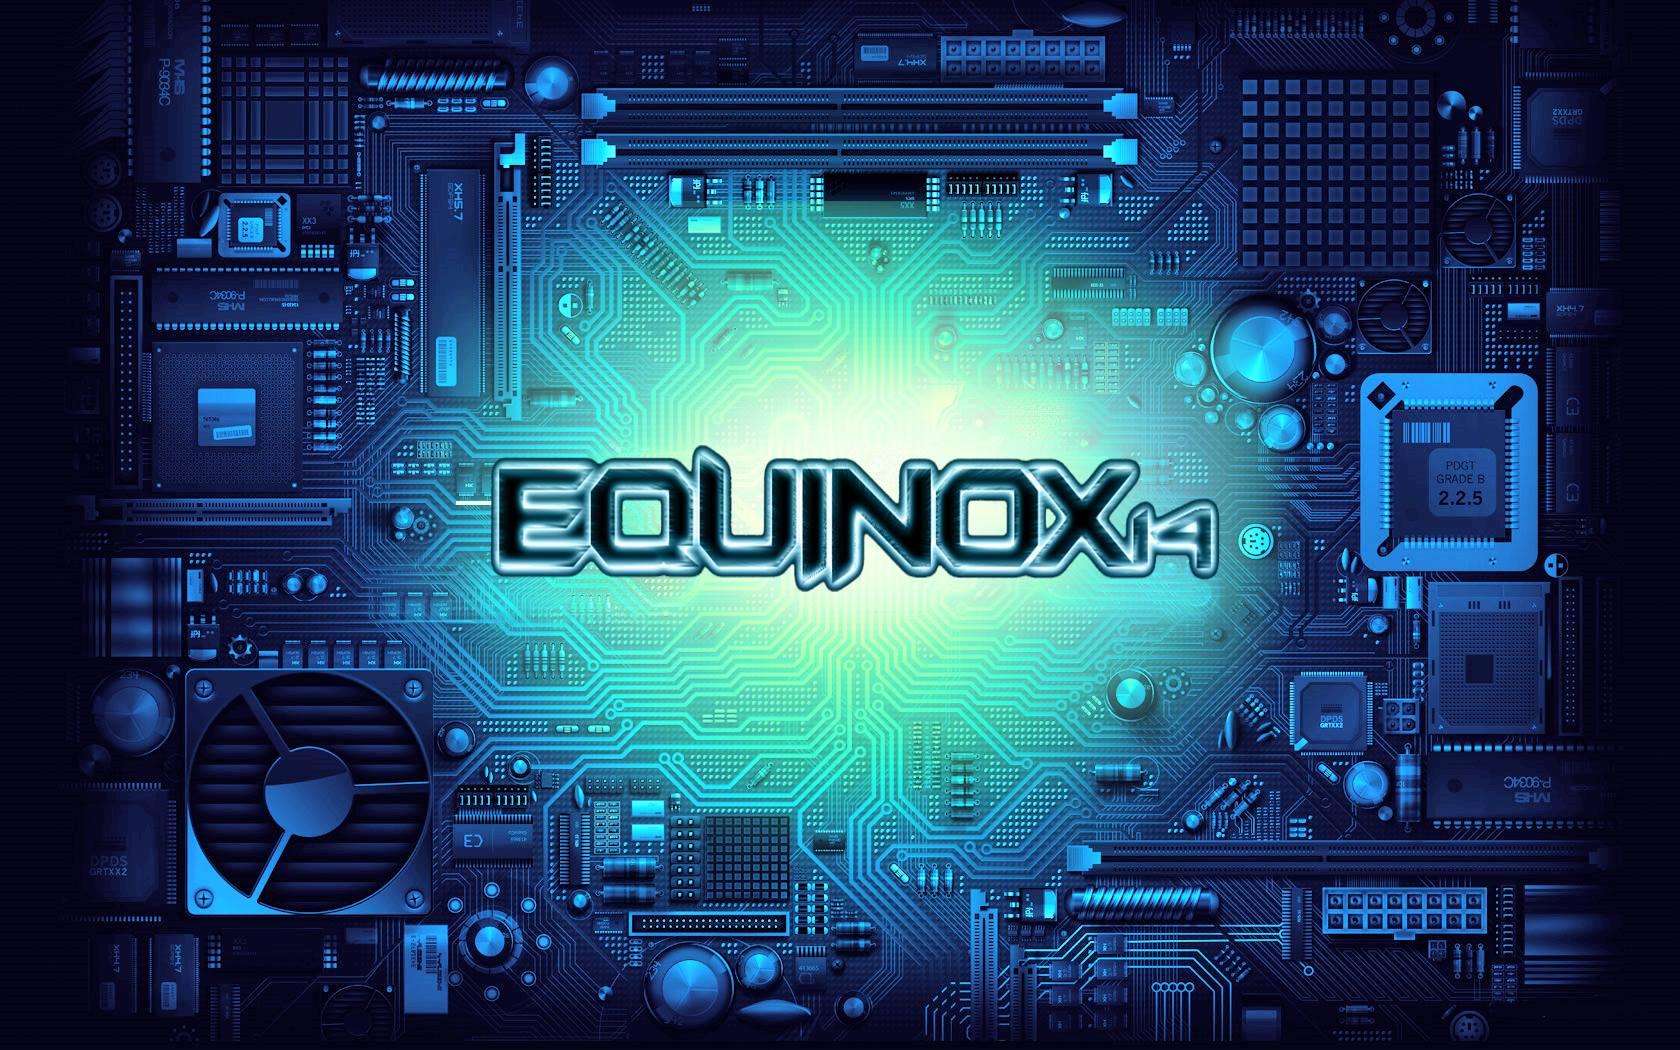 Equinox 2014 KK Wagh College of Engineering Nashik